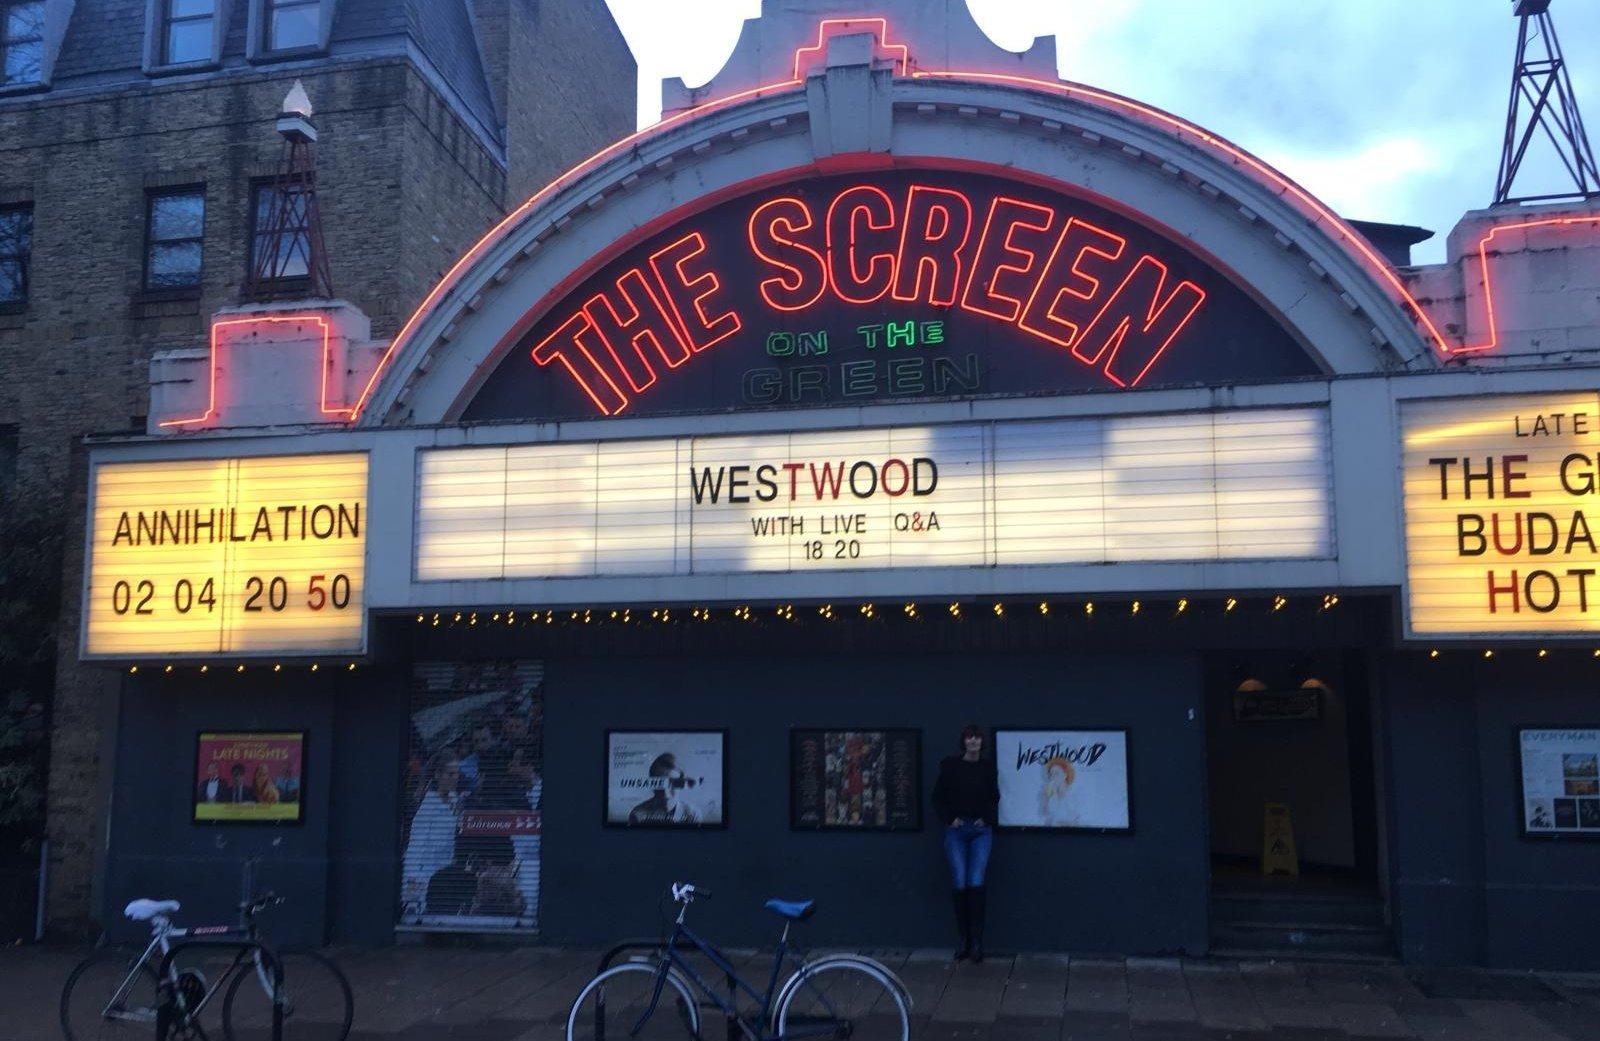 Q&A screening at Everyman Screen on the Green